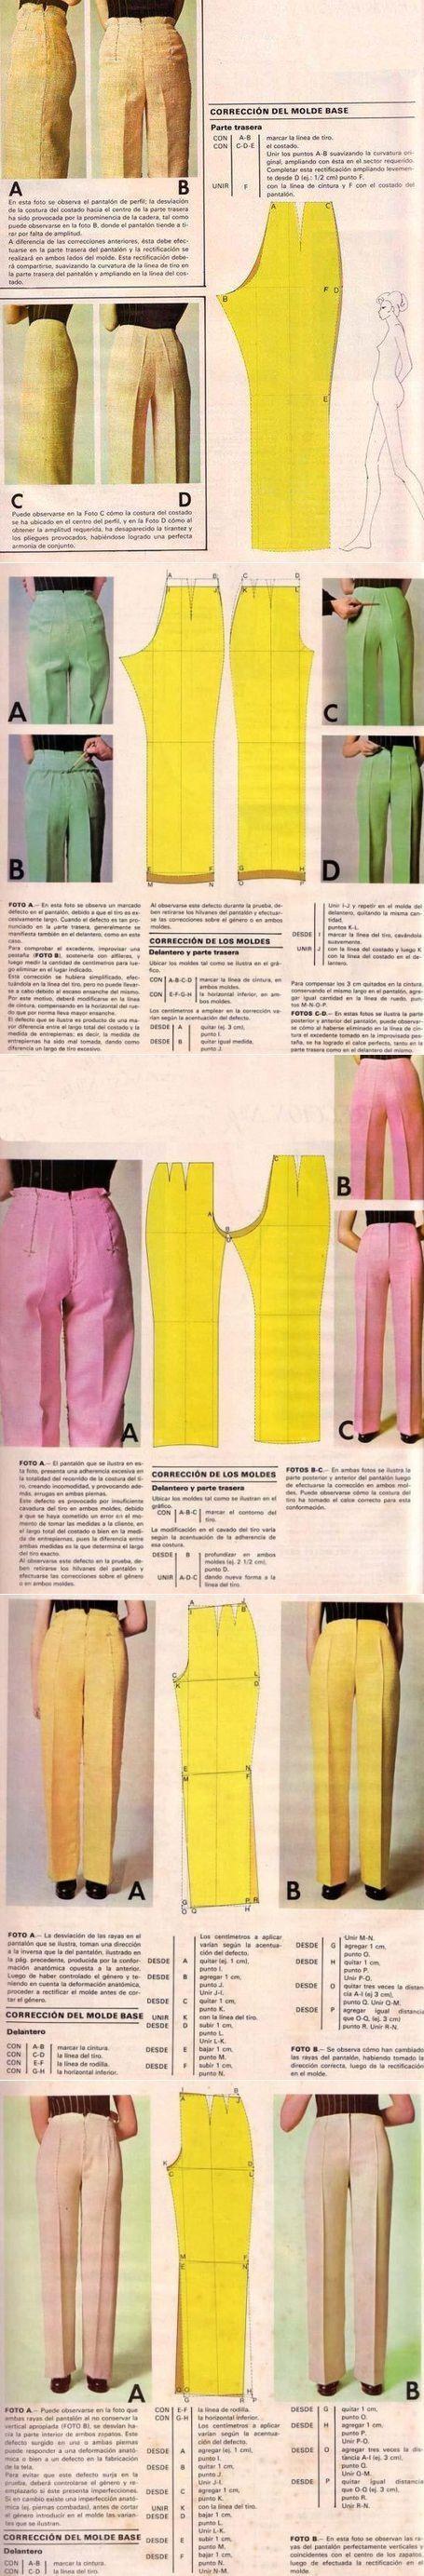 corrections de configuration de pantalon                                                                                                                                                                                 Más